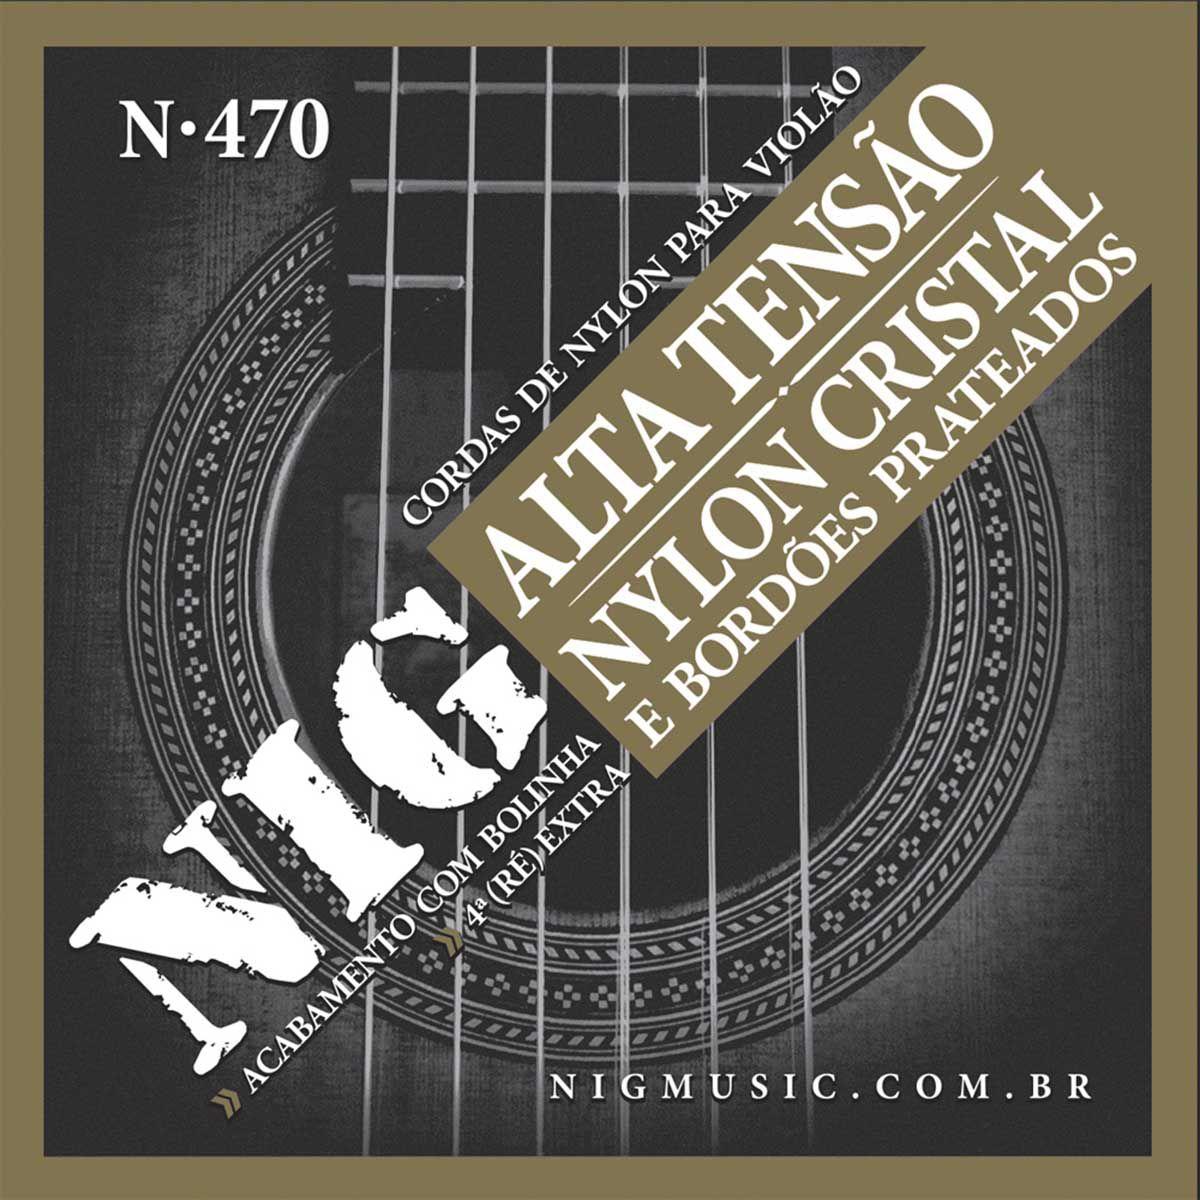 Encordoamento Nig N-470 029/044 para Violão Nylon